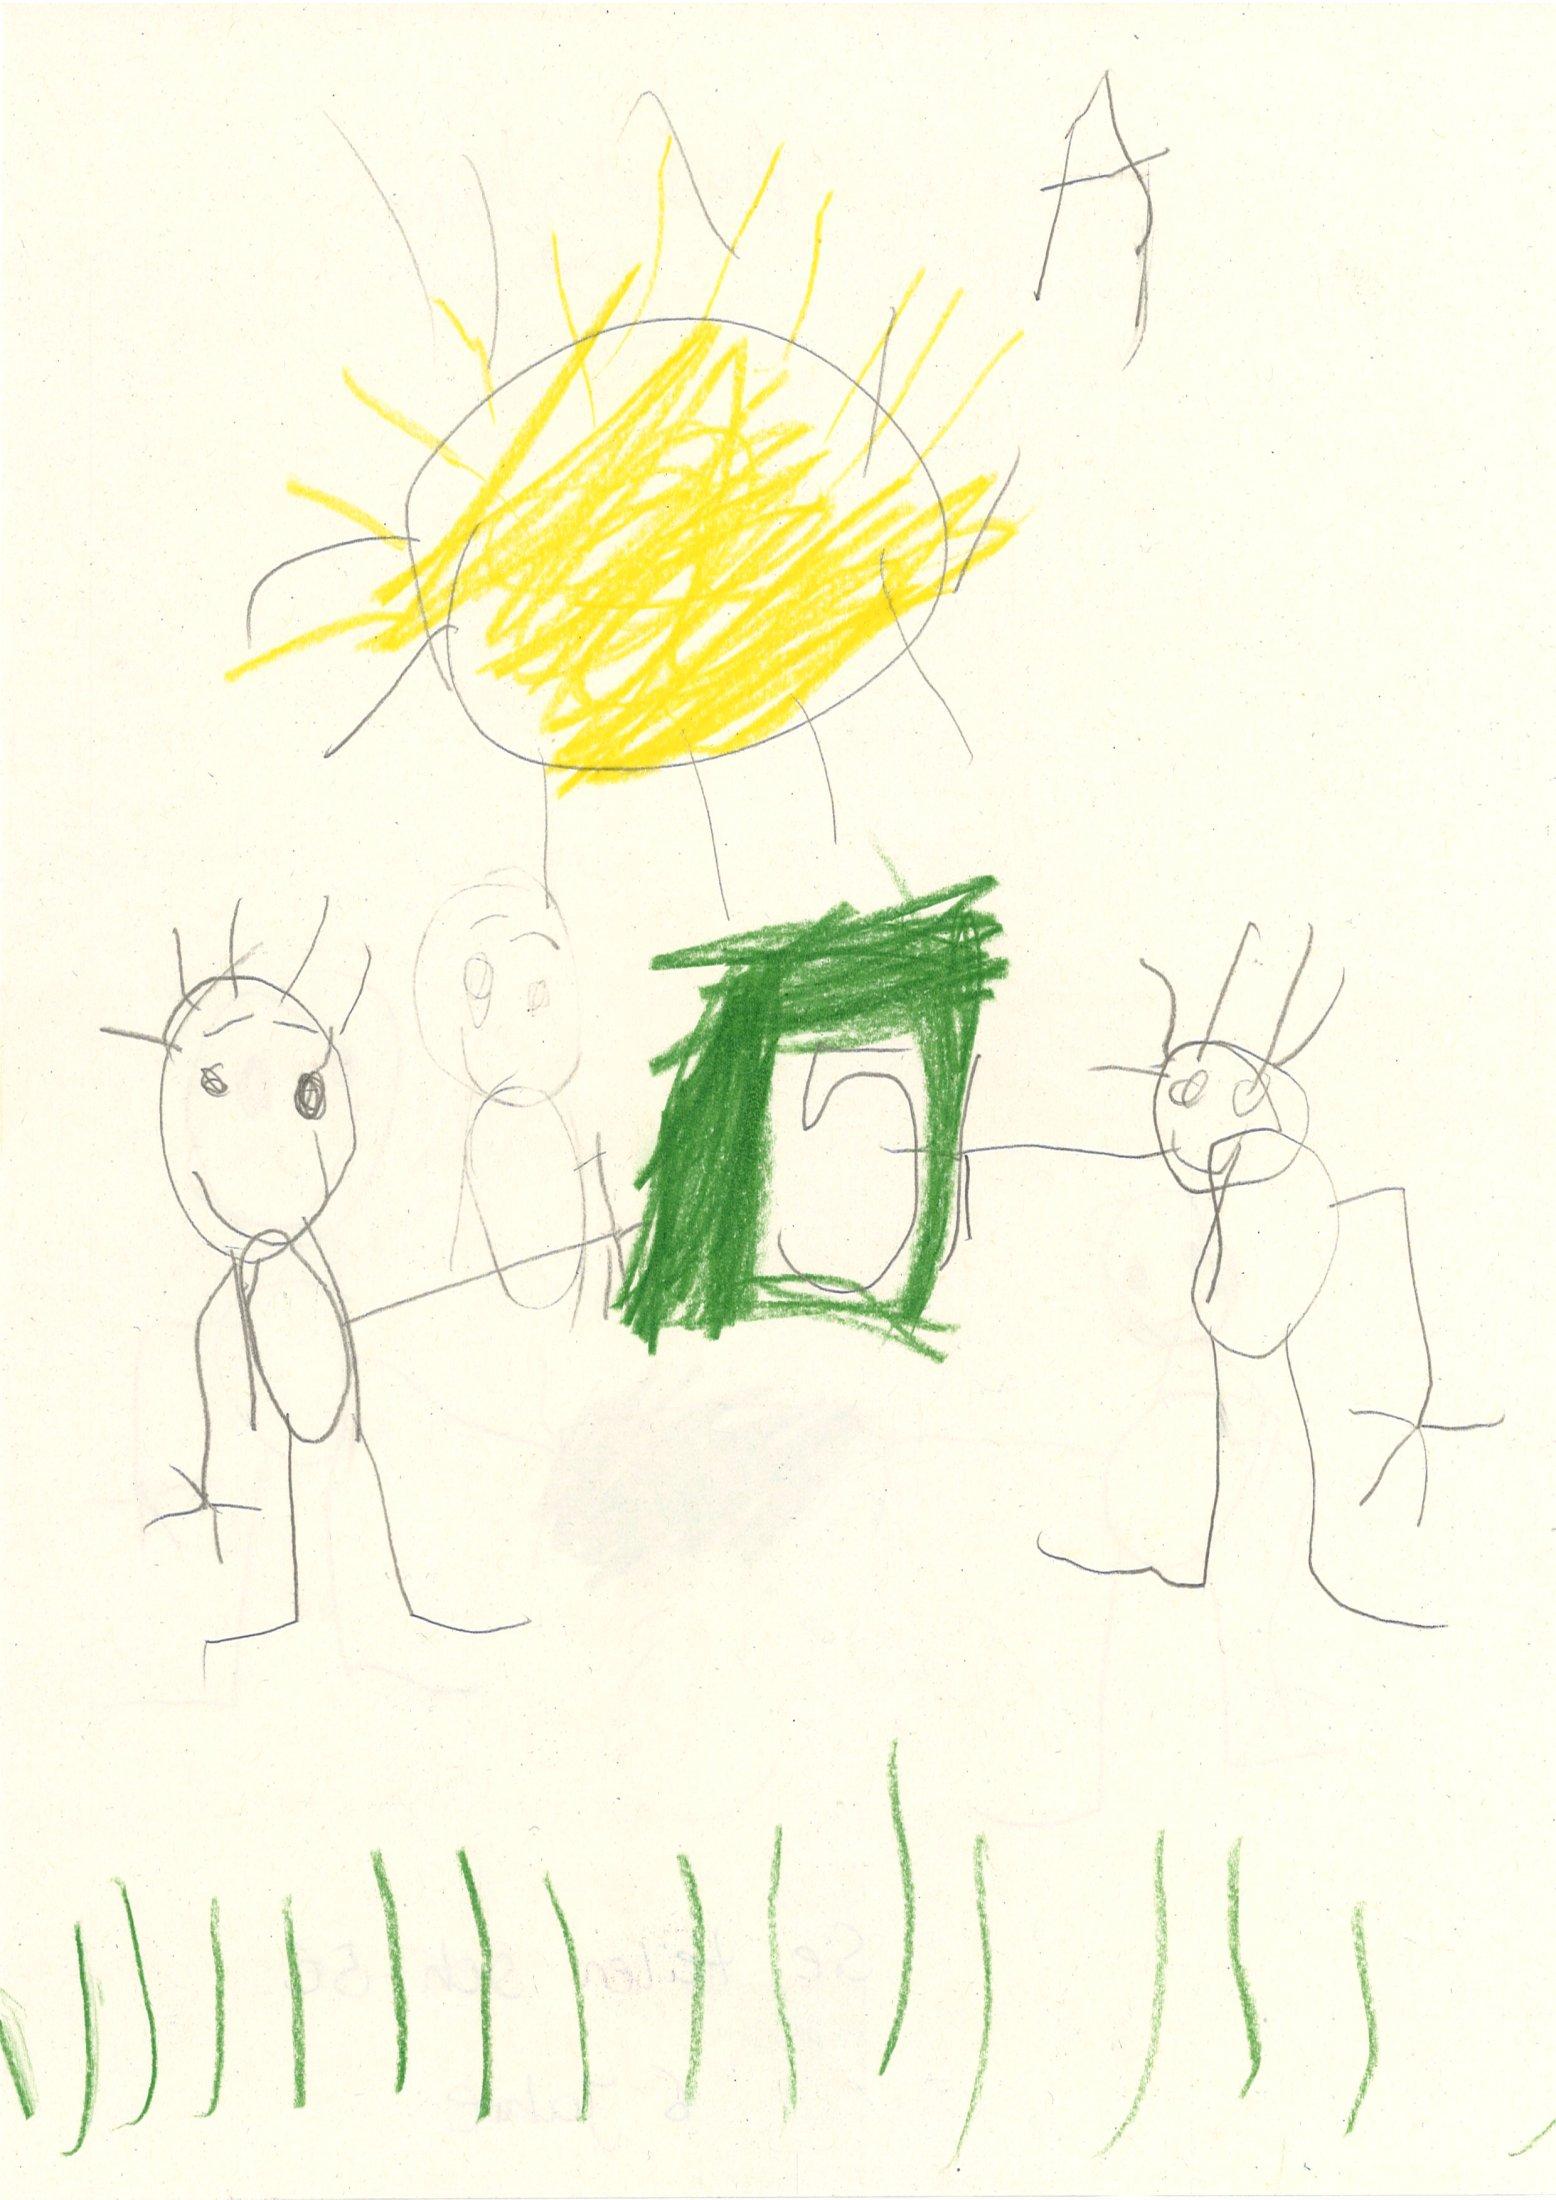 Abdulyhani, 6 Jahre